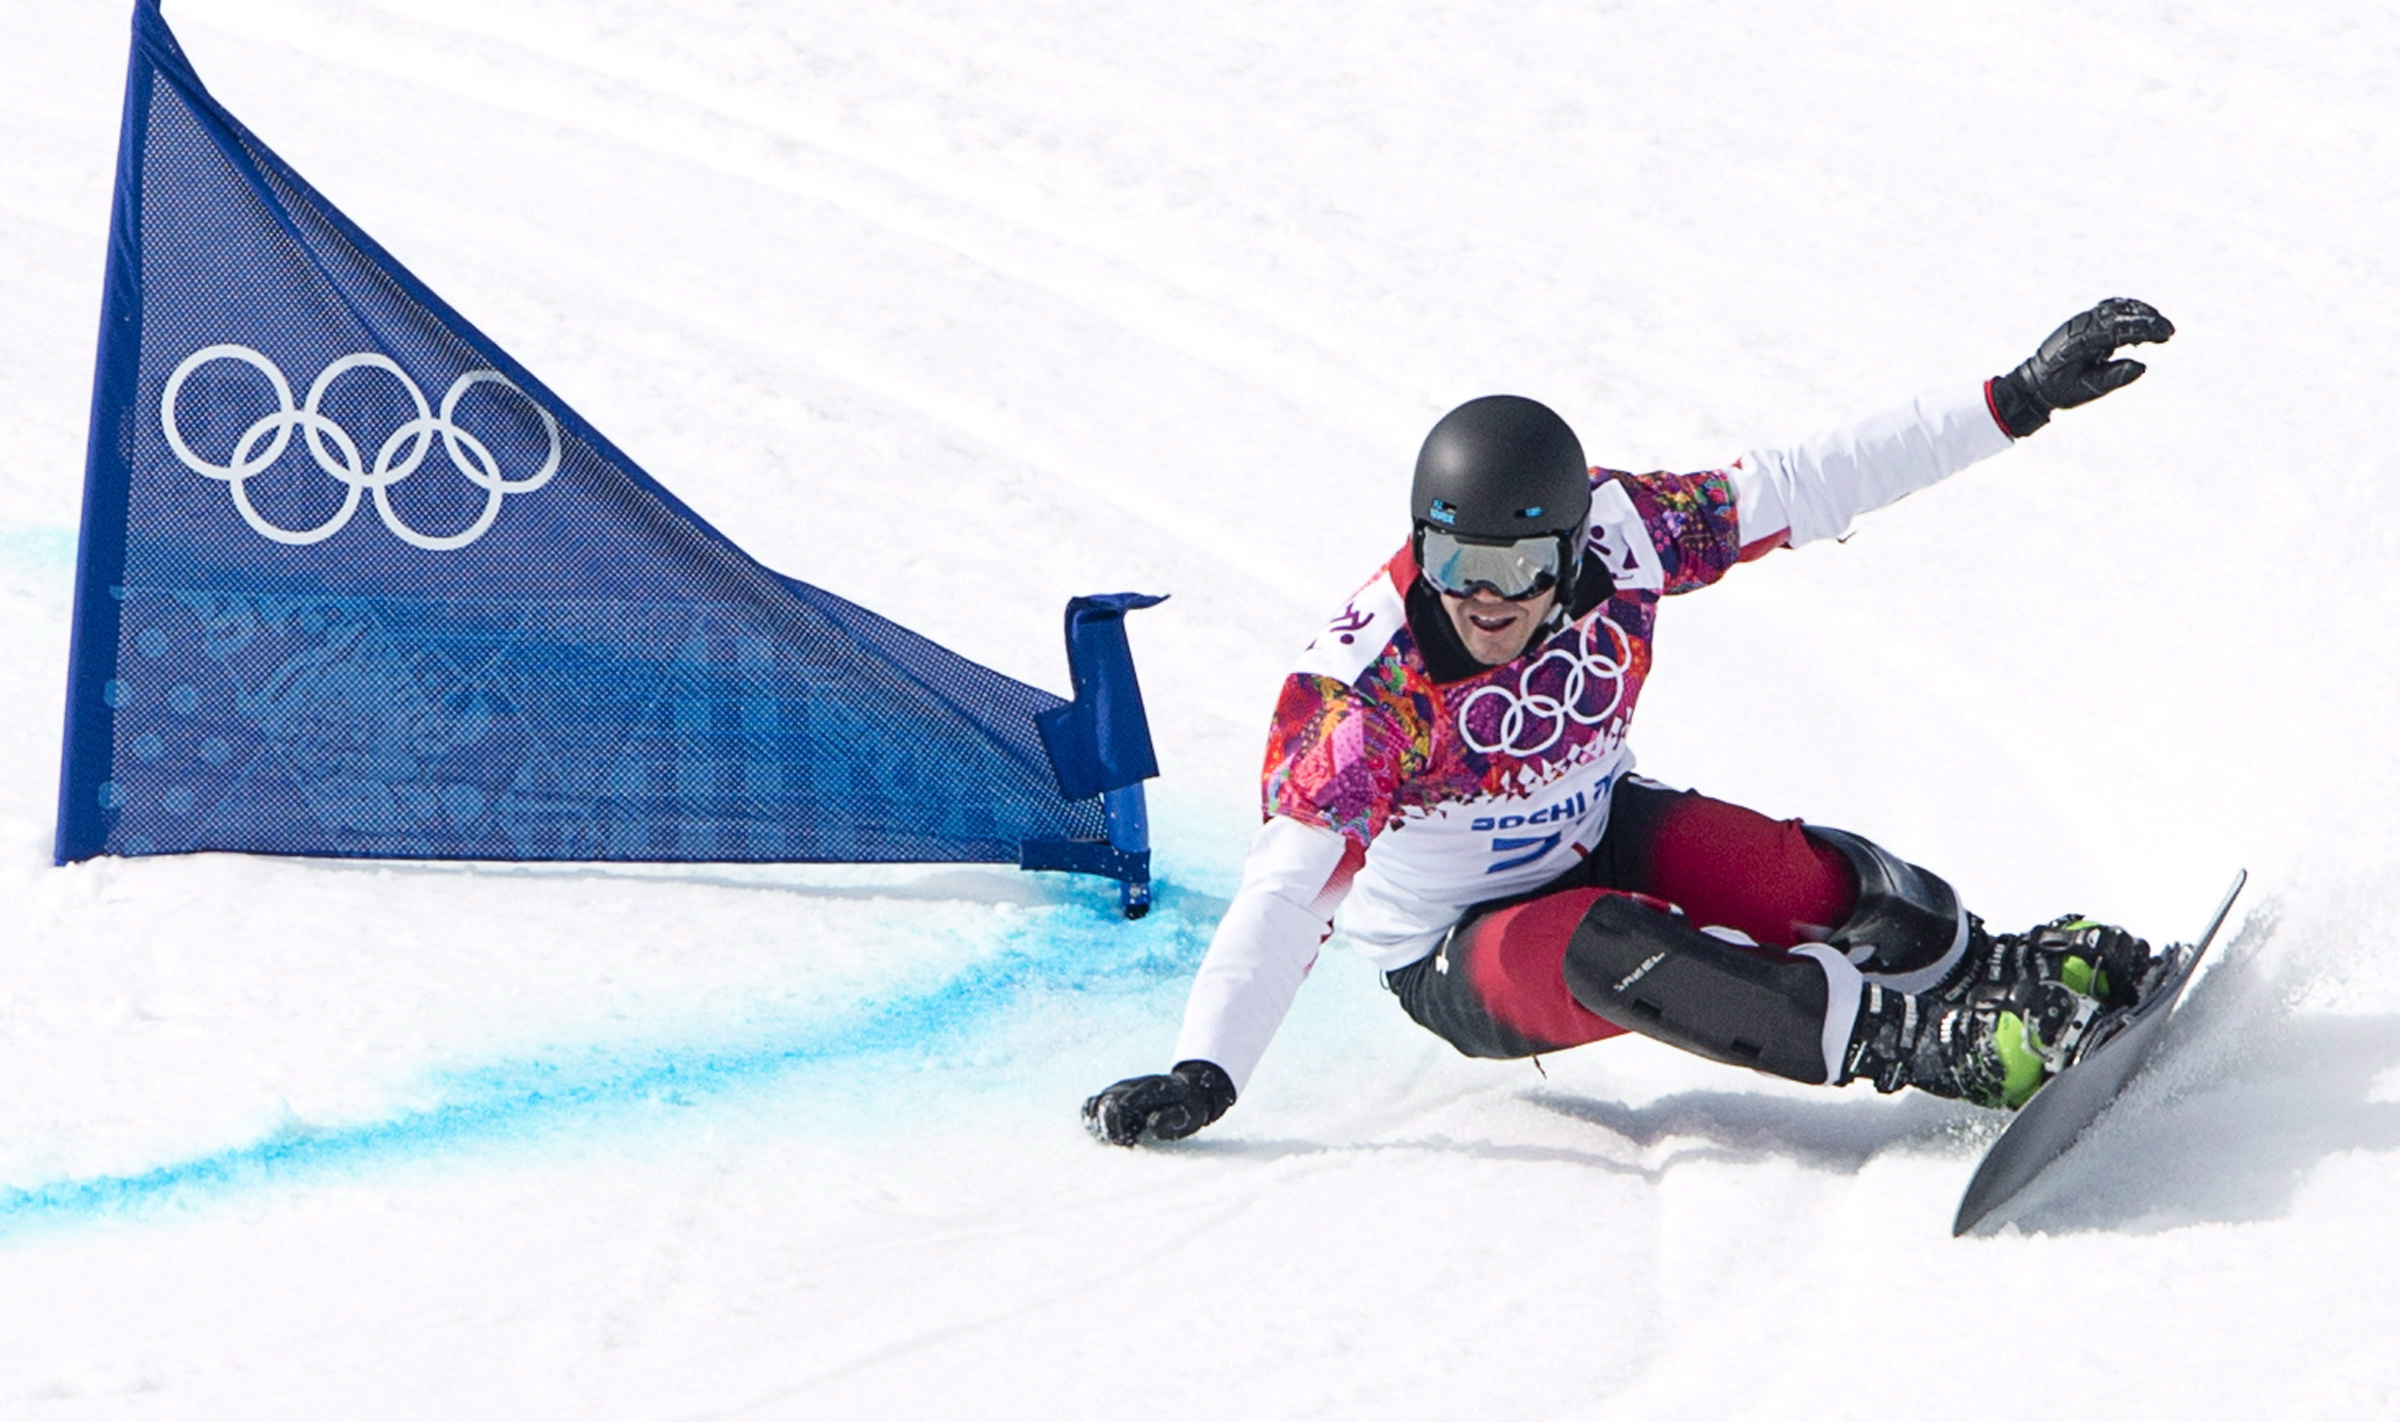 Team Canada - Jasey-Jay Anderson - Sochi 2014